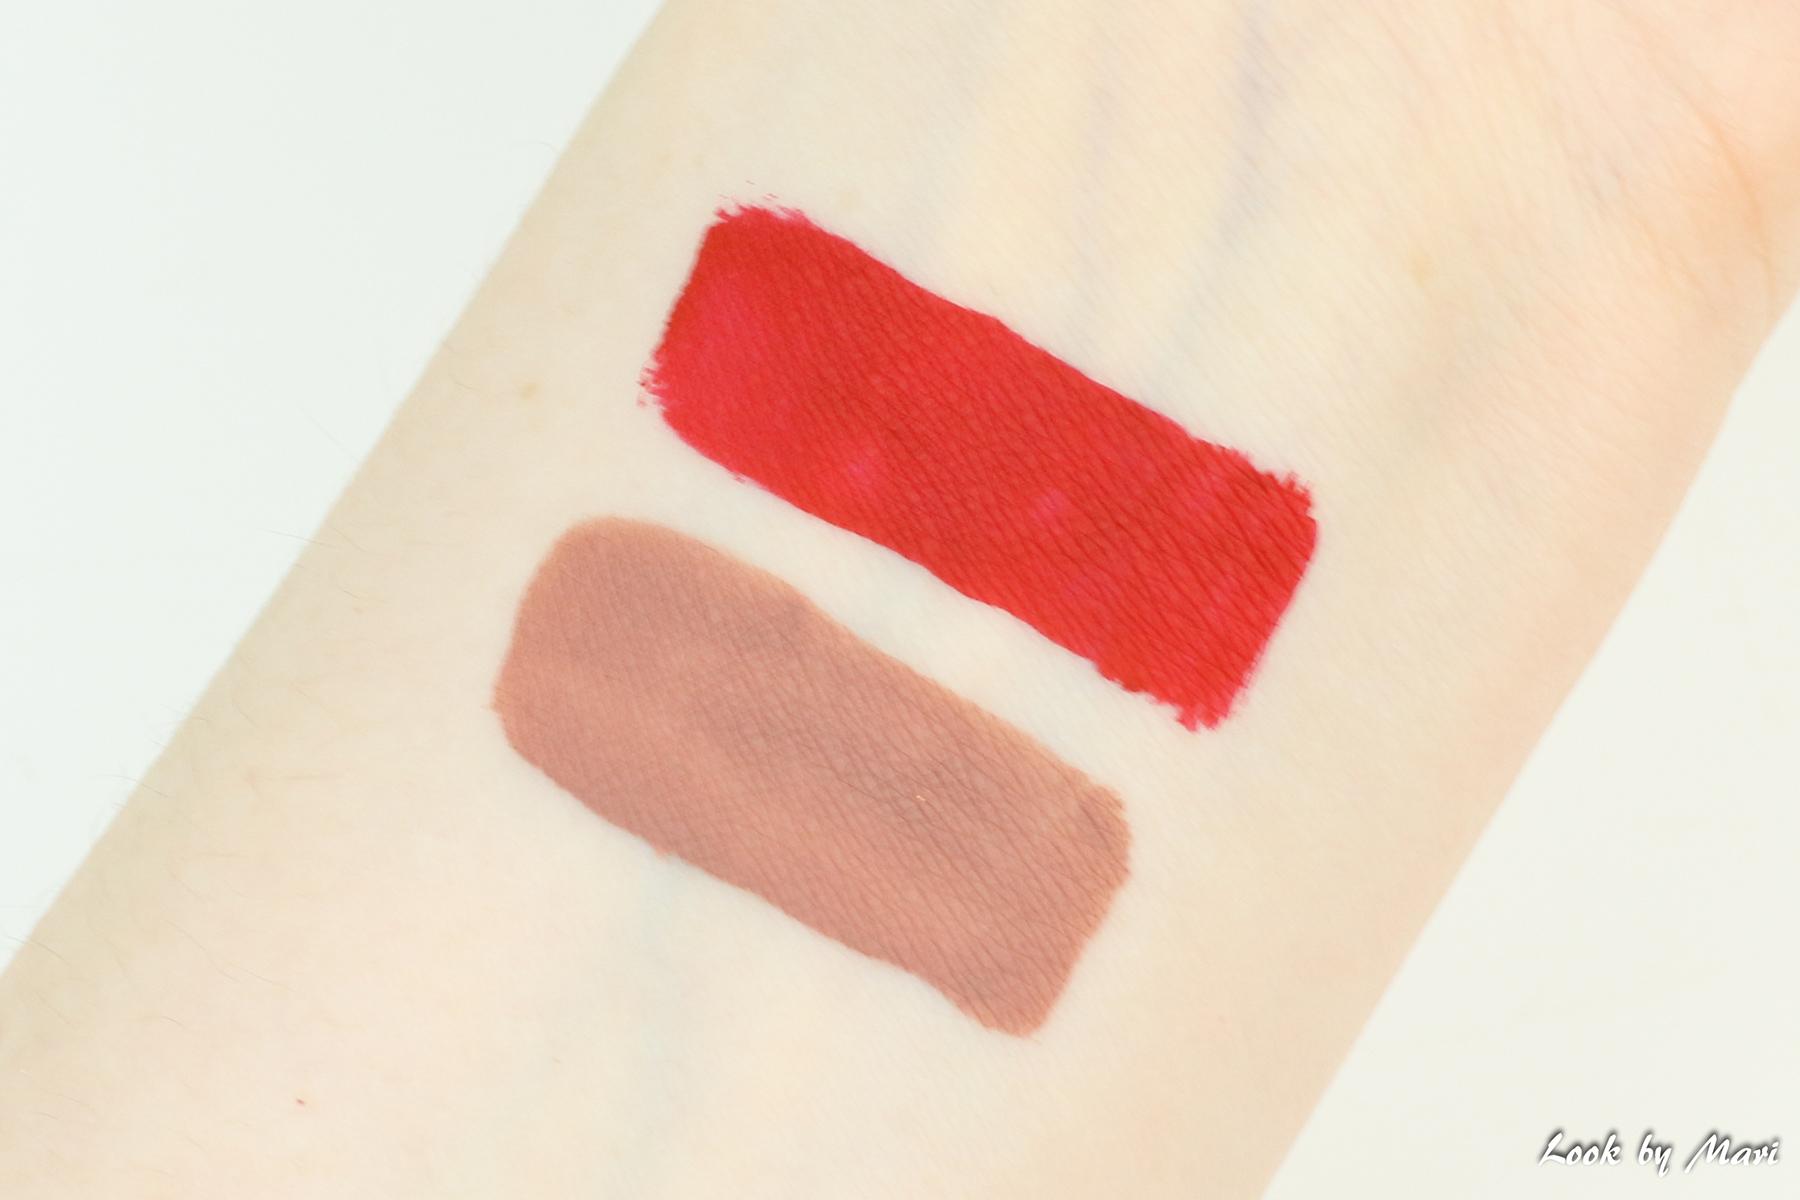 6 jeffree star velour liquid lipstick celebrity skin redrum sävyt värit kokemuksia oletkaunis.fi